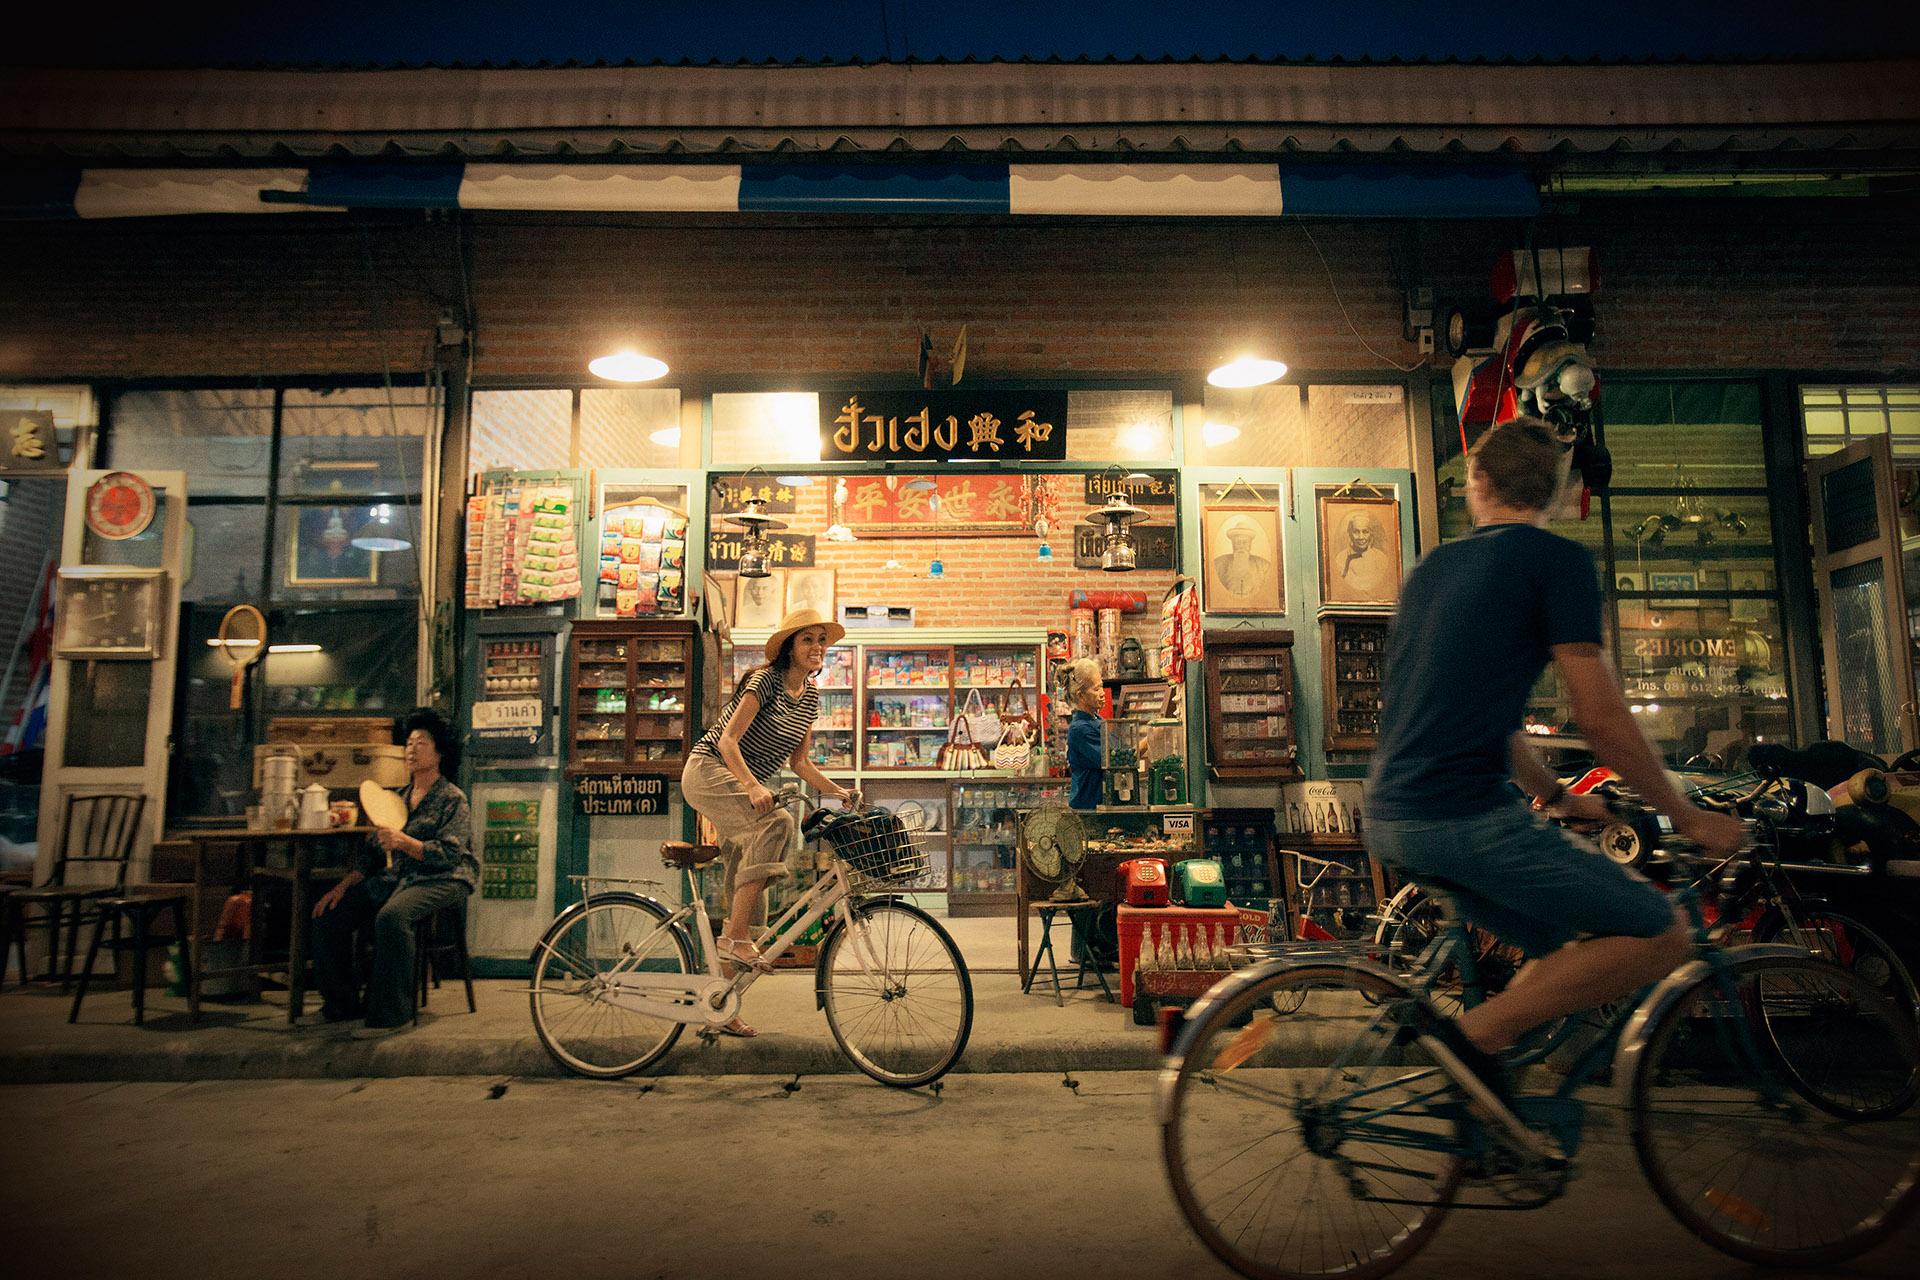 078 VISA_Thailand Rod Fai Night 130515